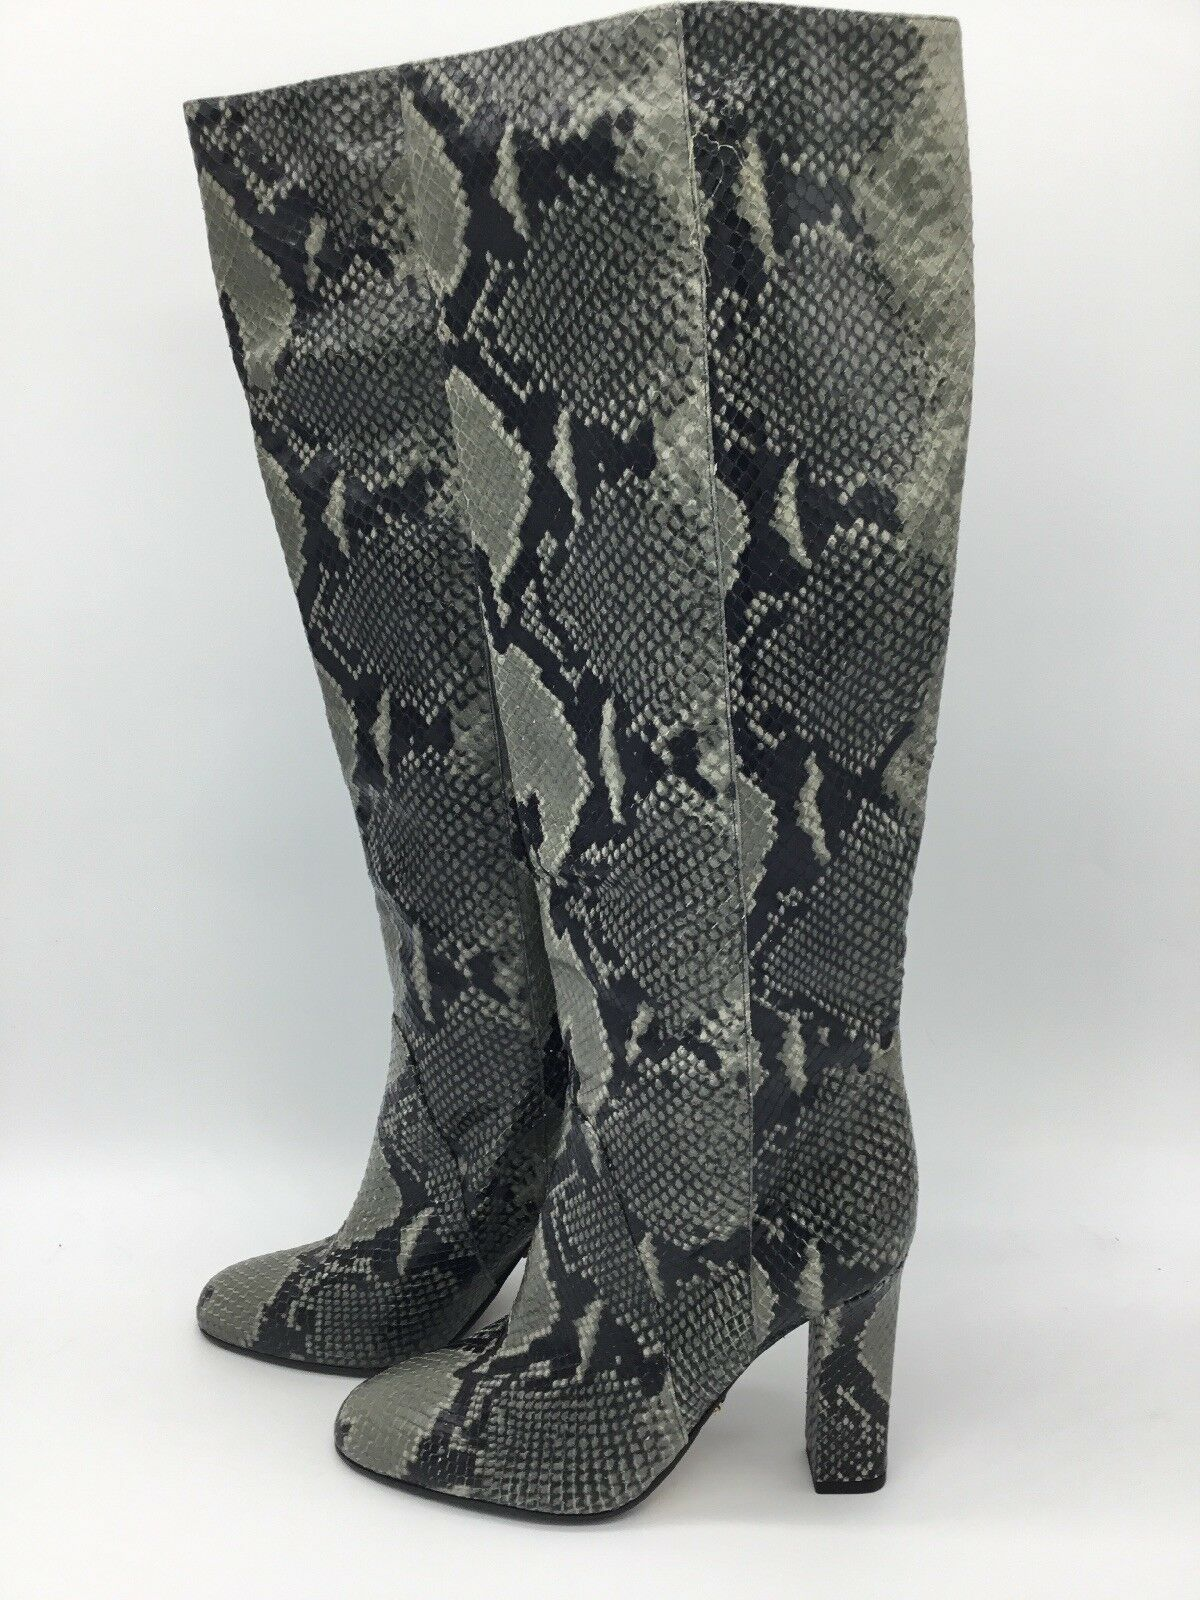 Aquatalia  Snakeskin Knee-high Boots Sz 6.5B New